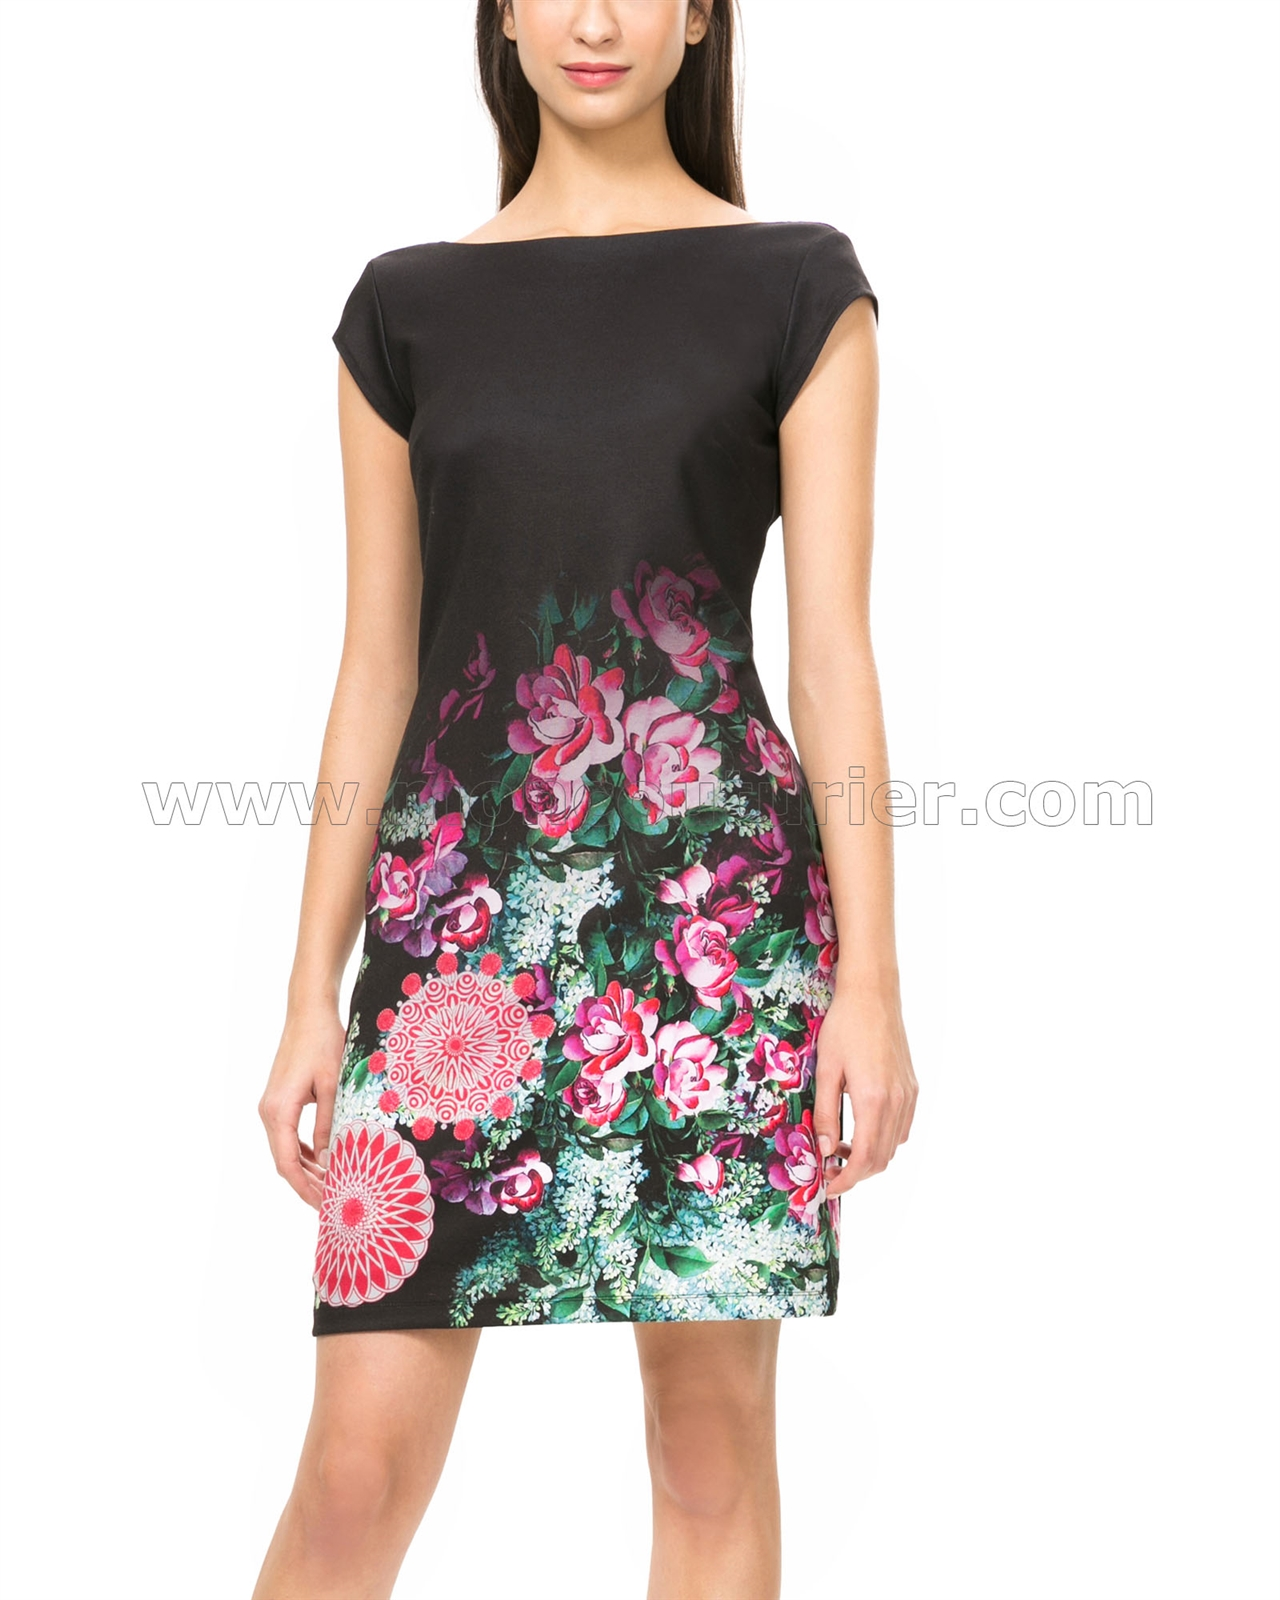 Plus Size Womens Dresses